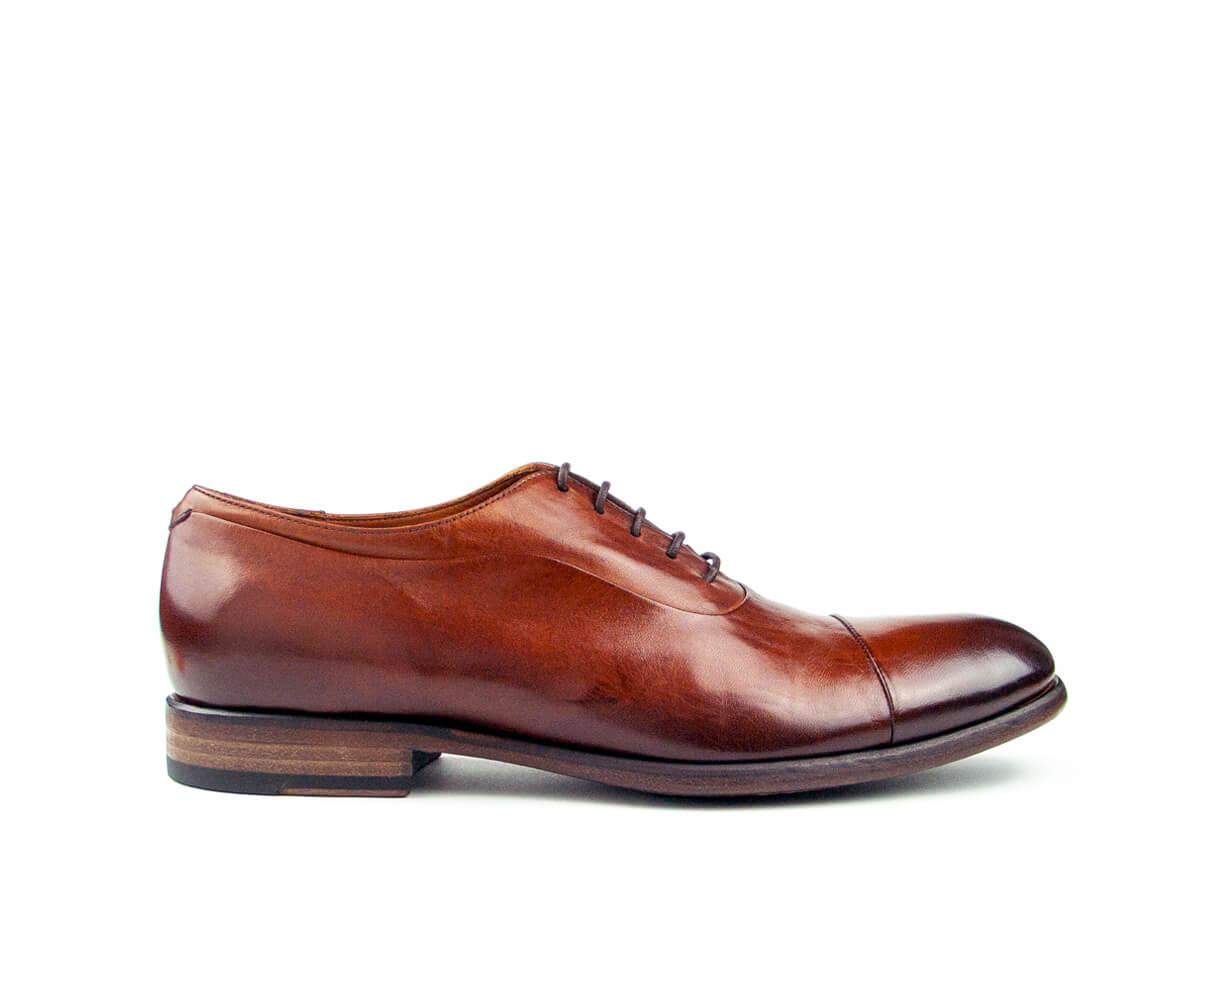 014 ecla scarpe rgb